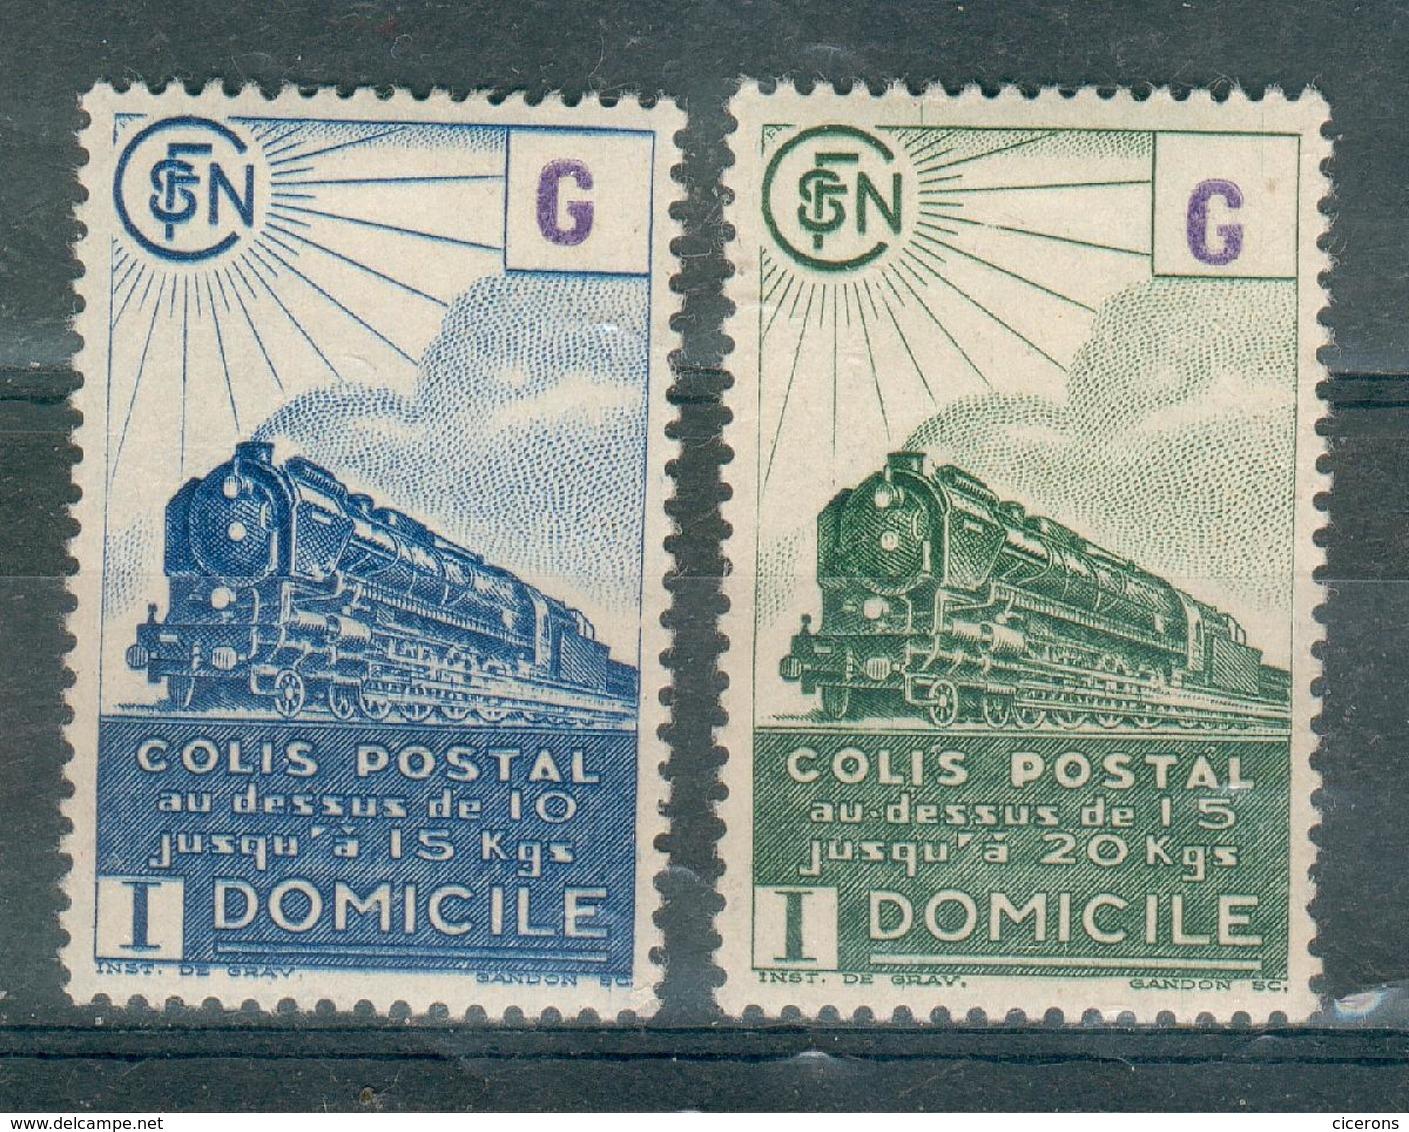 FRANCE ; Colis Postaux ; 1945 ; Maury N° 211sf ; Neuf - Colis Postaux